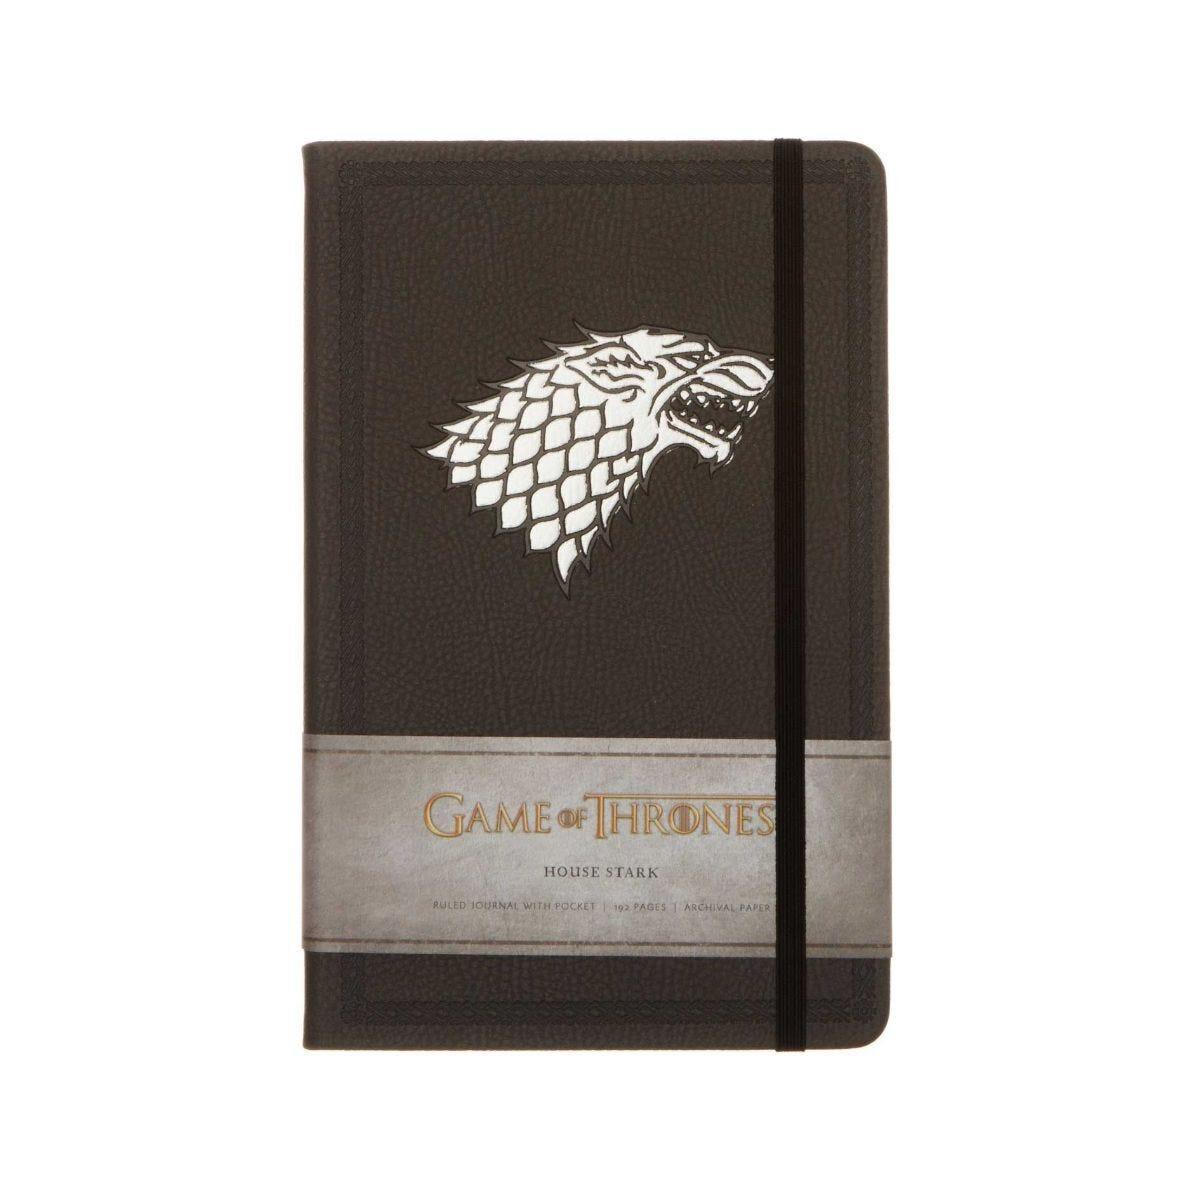 Game of Thrones House of Stark Ruled Journal